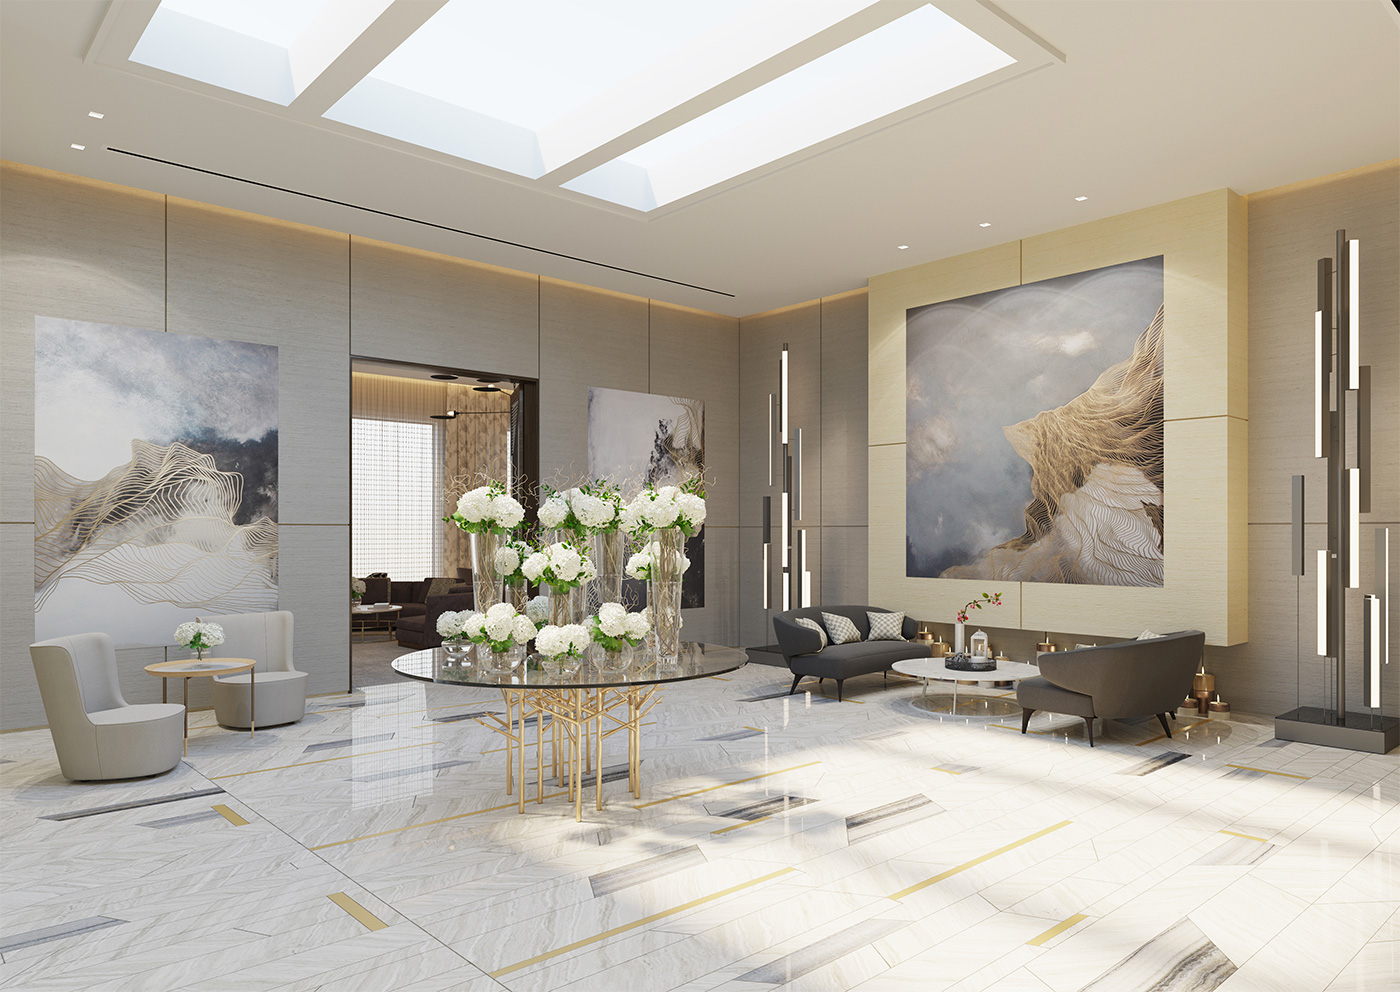 Interior-Designer-Dubai-From-CeciliaClasonInteriors.com_